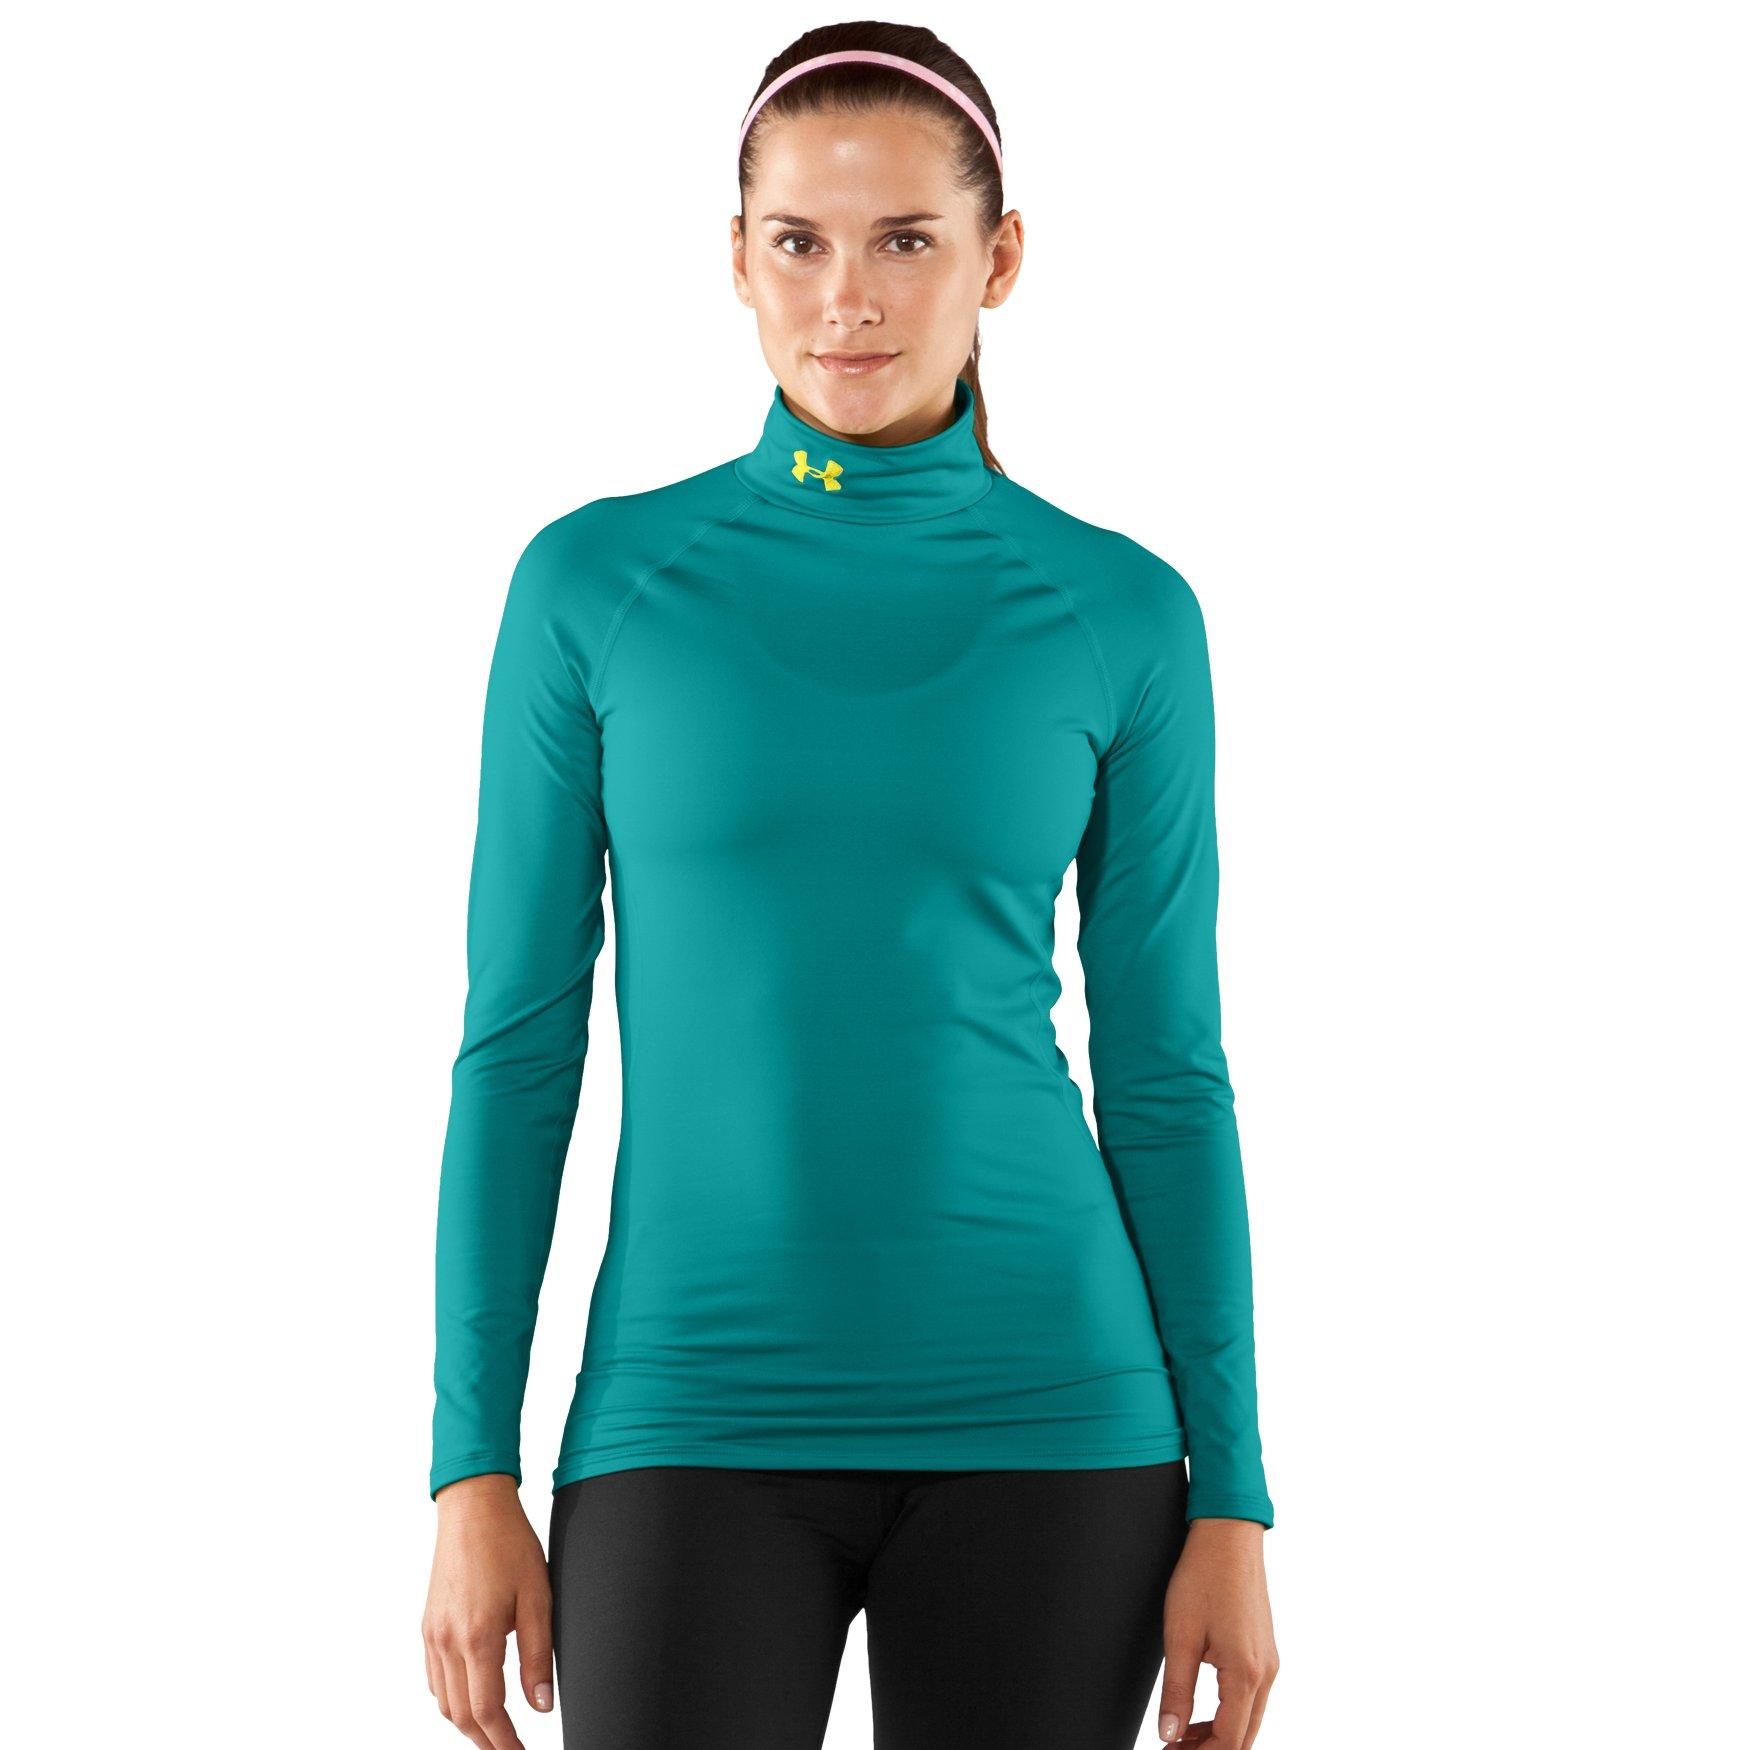 a989559af shannan Asks About Women's UA EVO ColdGear® Longsleeve Mock - Needle